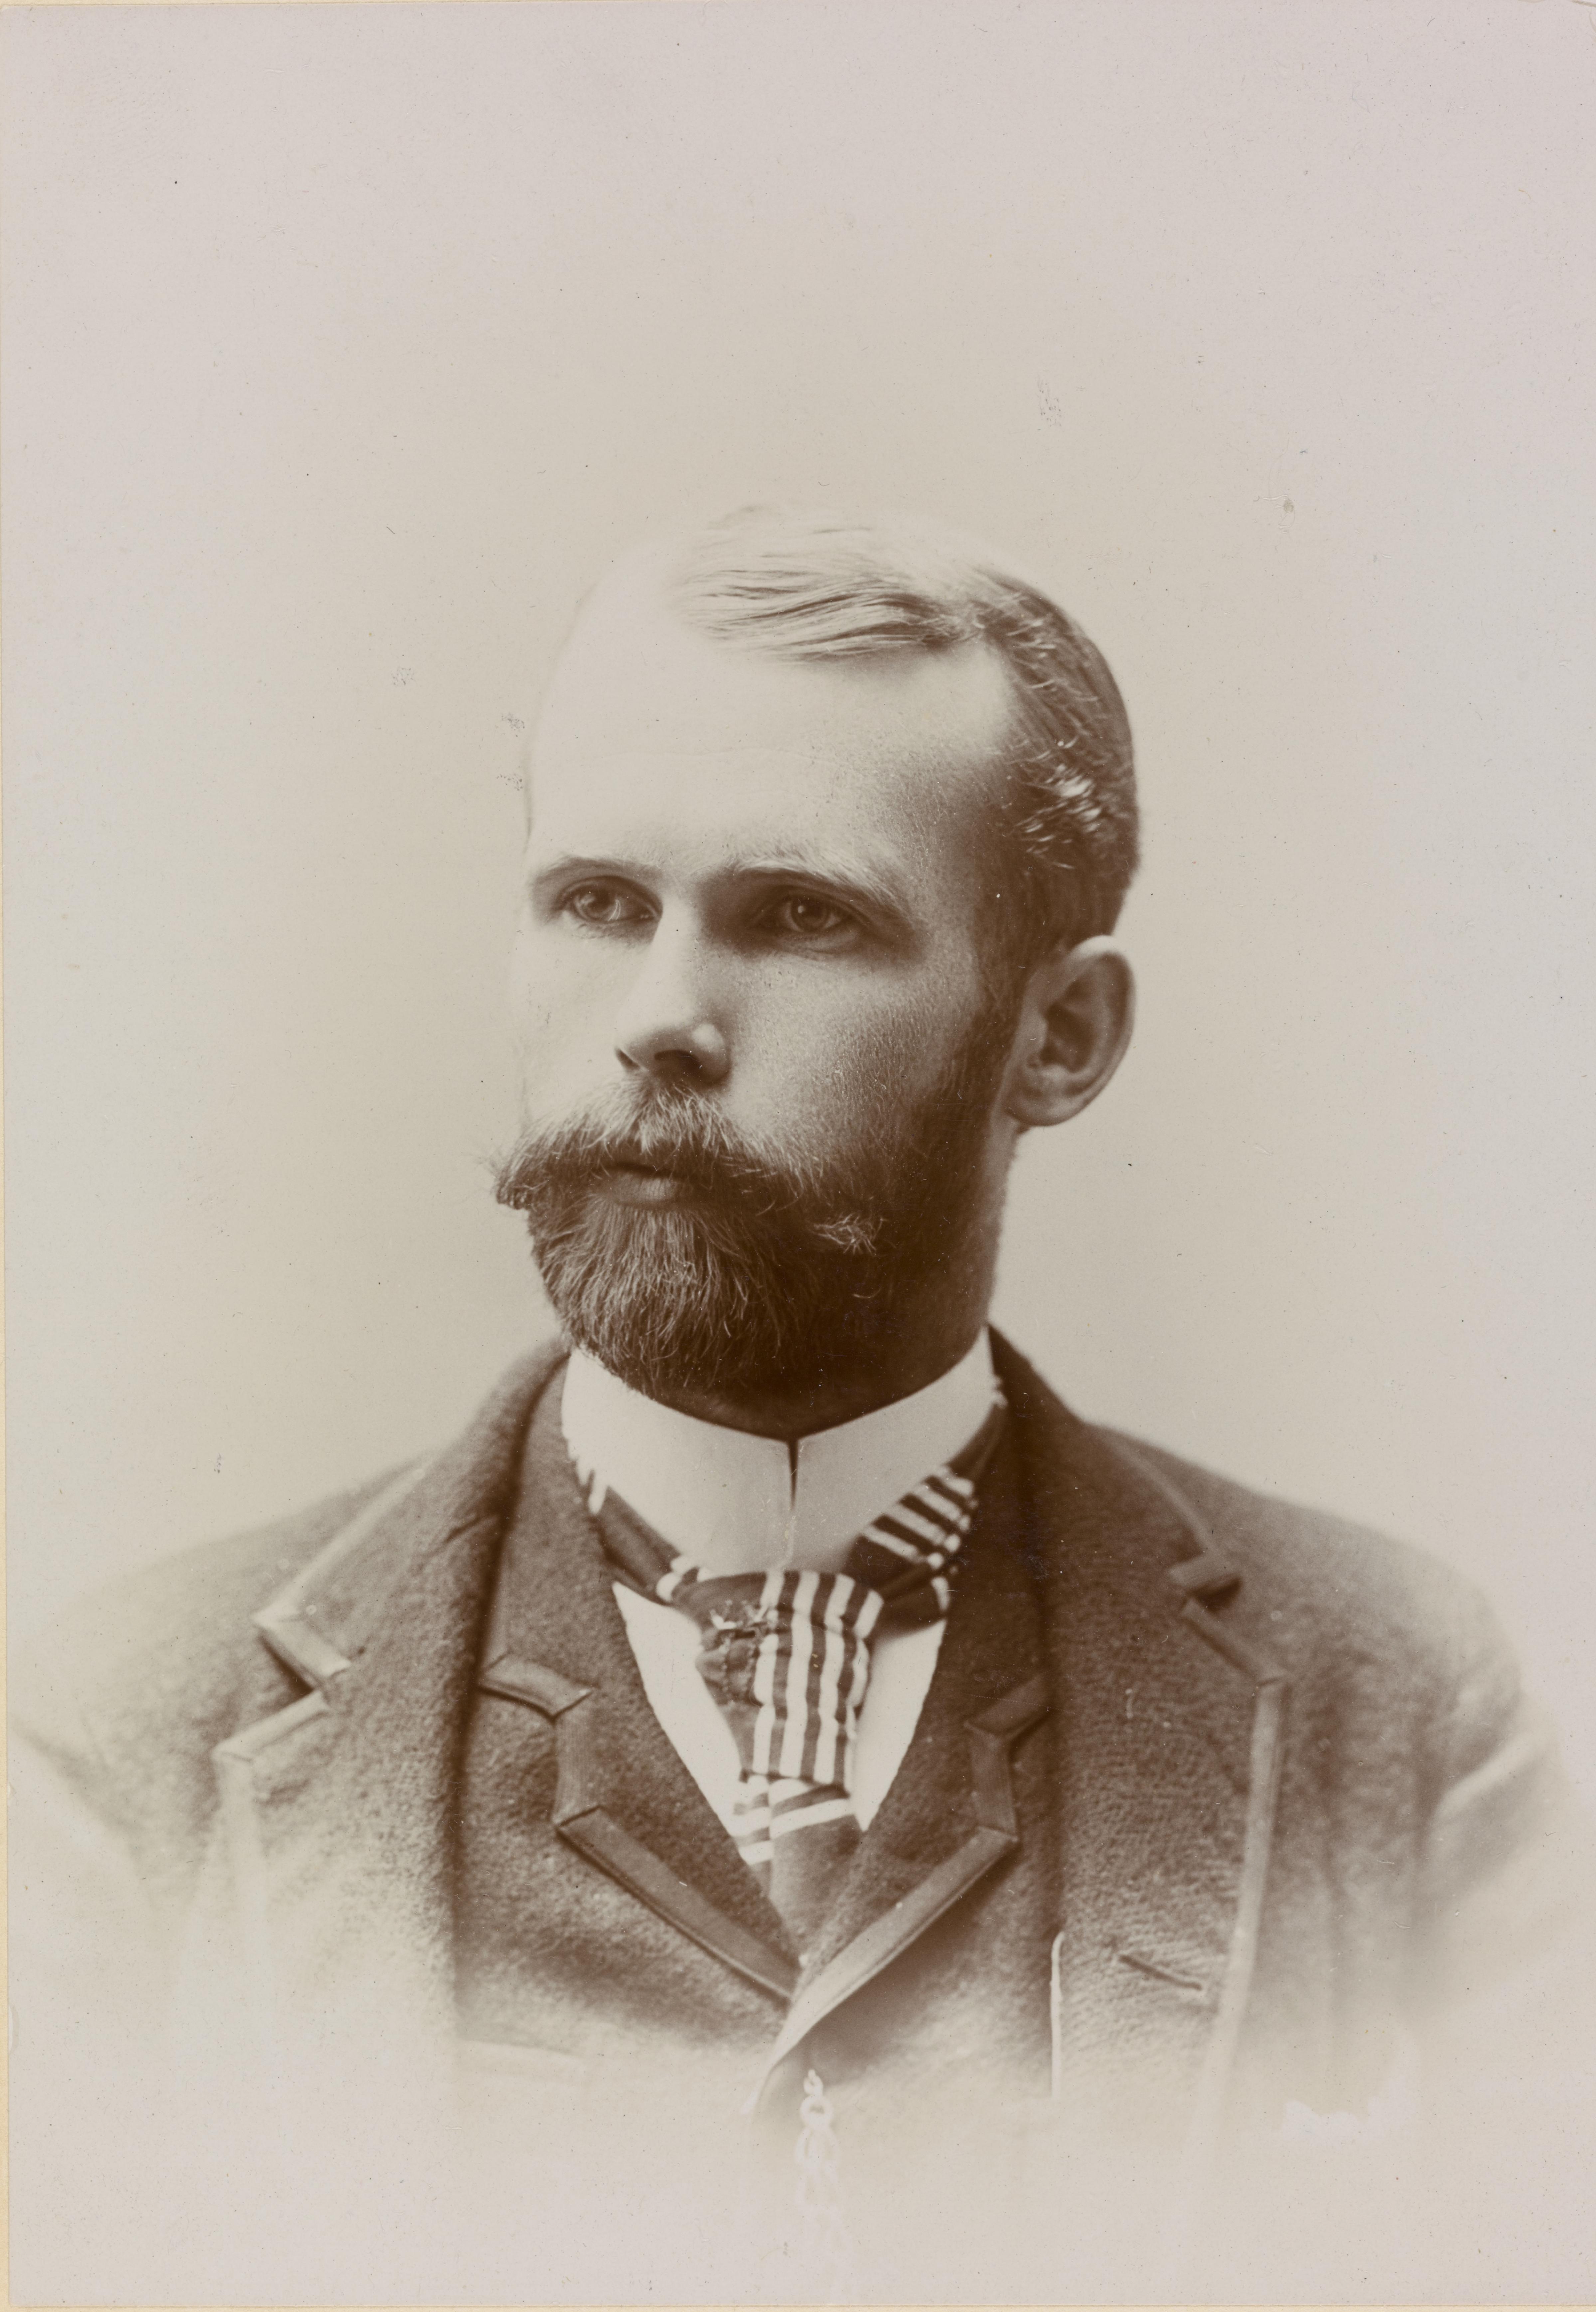 Image of Anders Beer Wilse from Wikidata